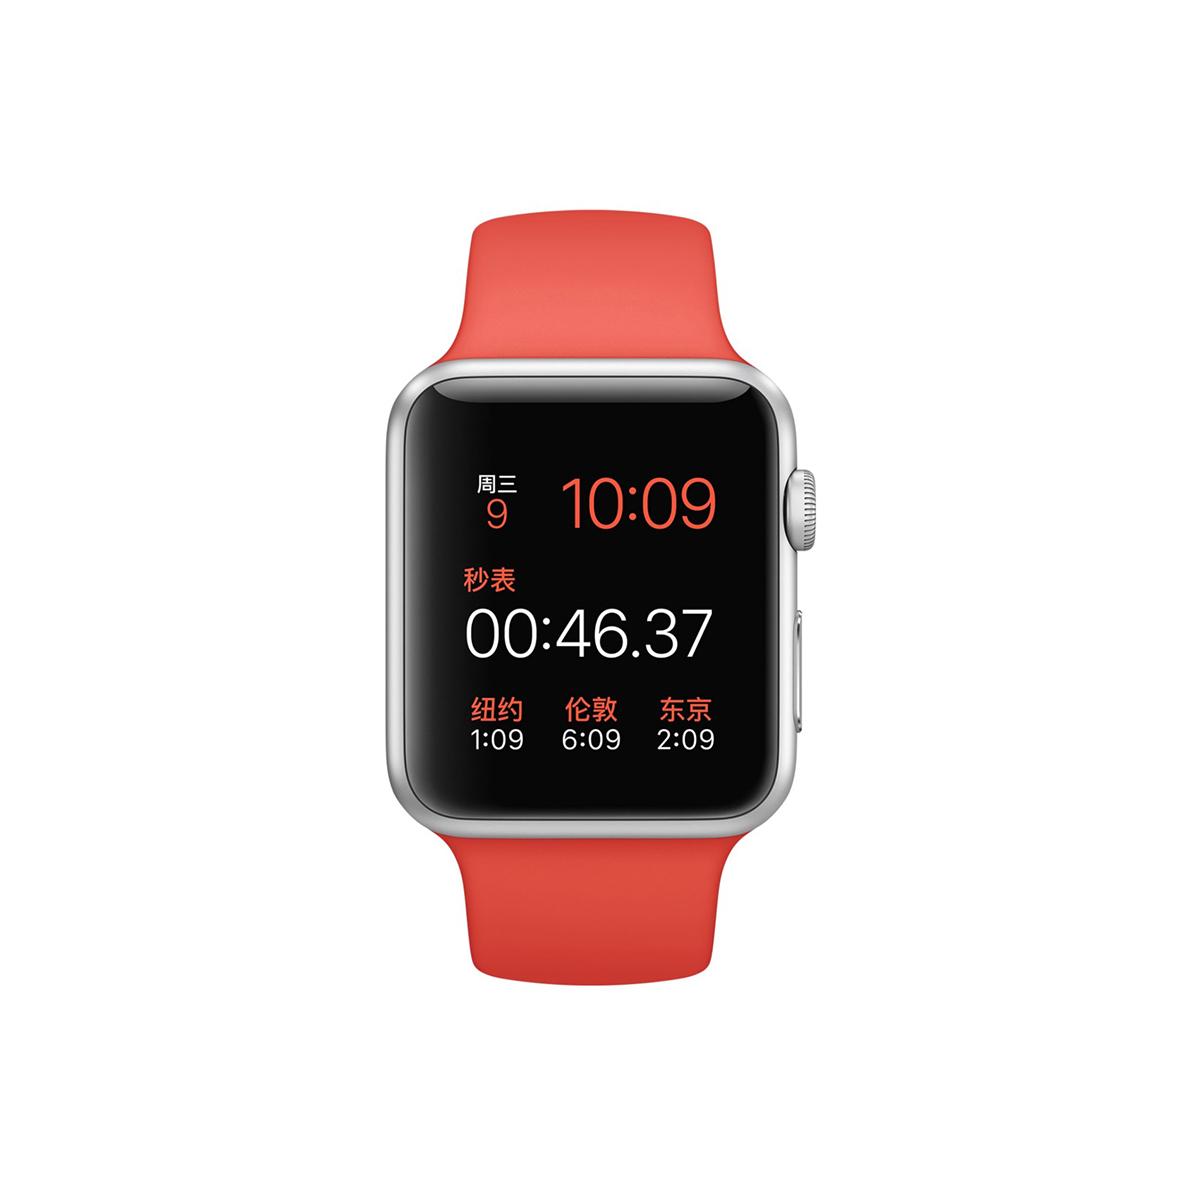 Apple/苹果 Apple Watch 银色铝金属表壳搭配橙色运动型表带